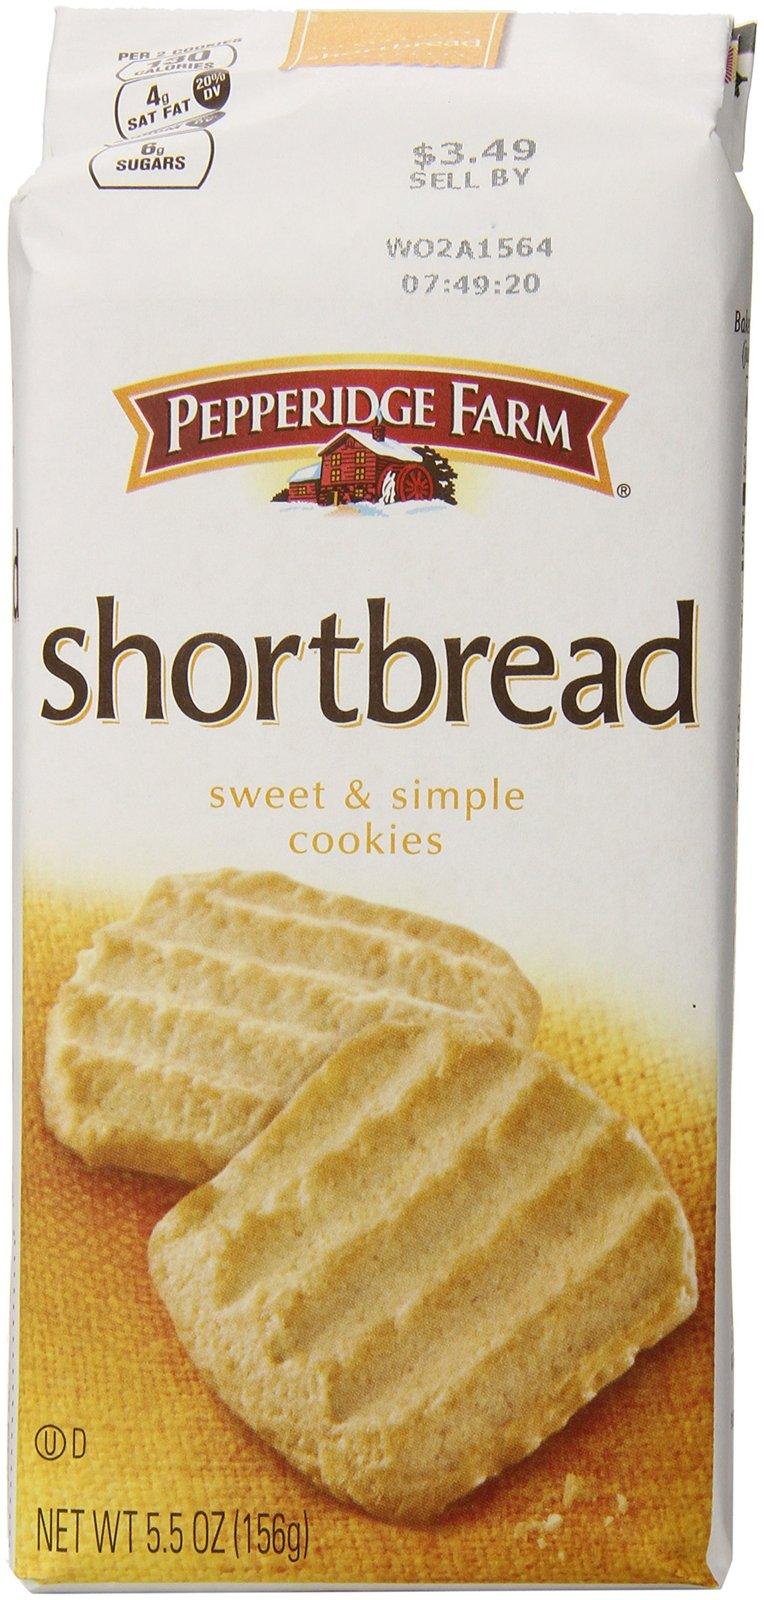 Pepperidge Farm Shortbread Cookies, 5.5 oz. Bag